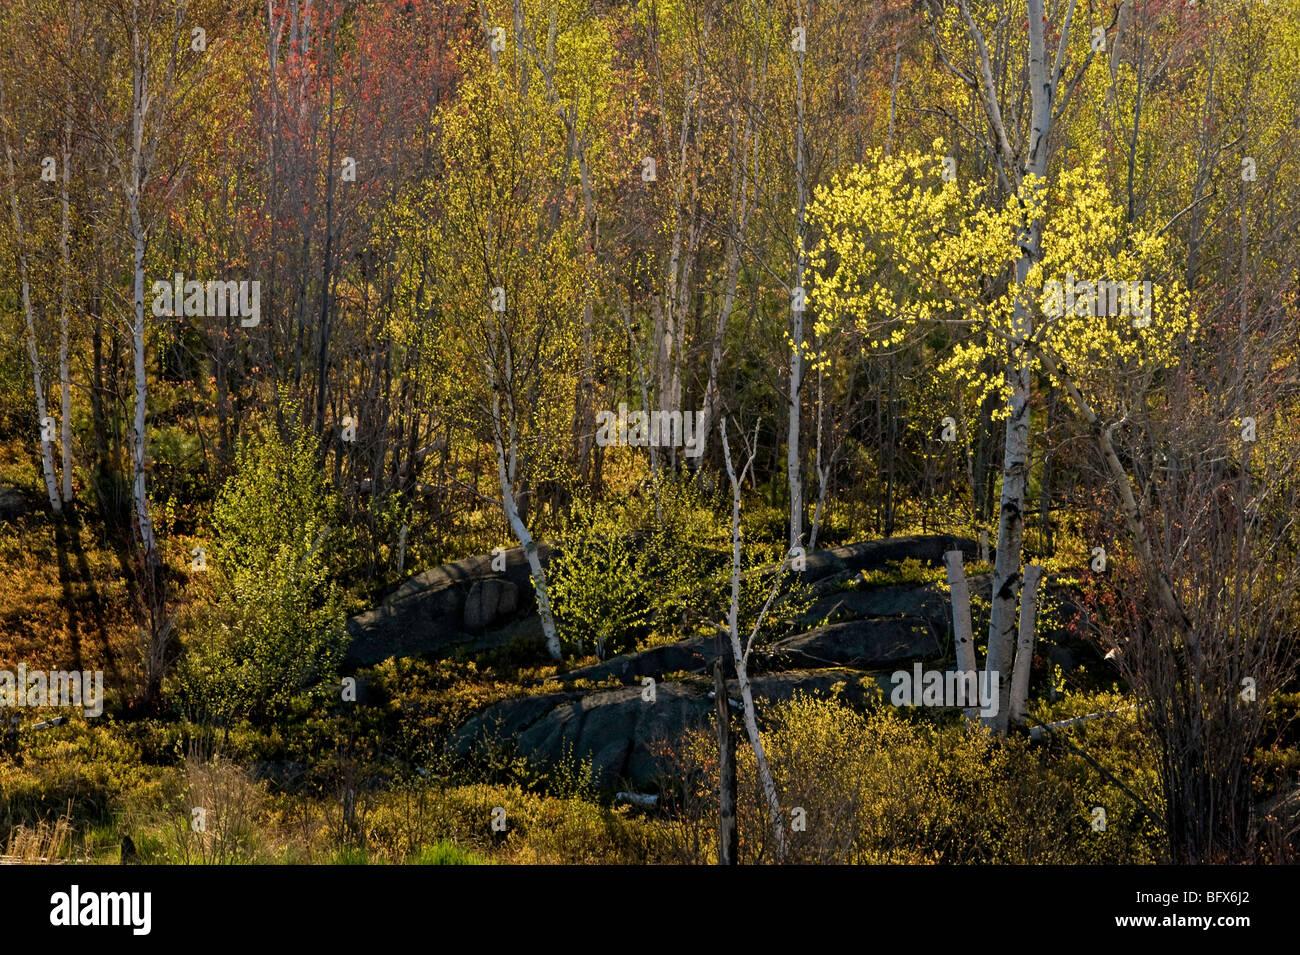 Spring foliage in aspen tree and birch trees, Greater Sudbury, Ontario, Canada - Stock Image